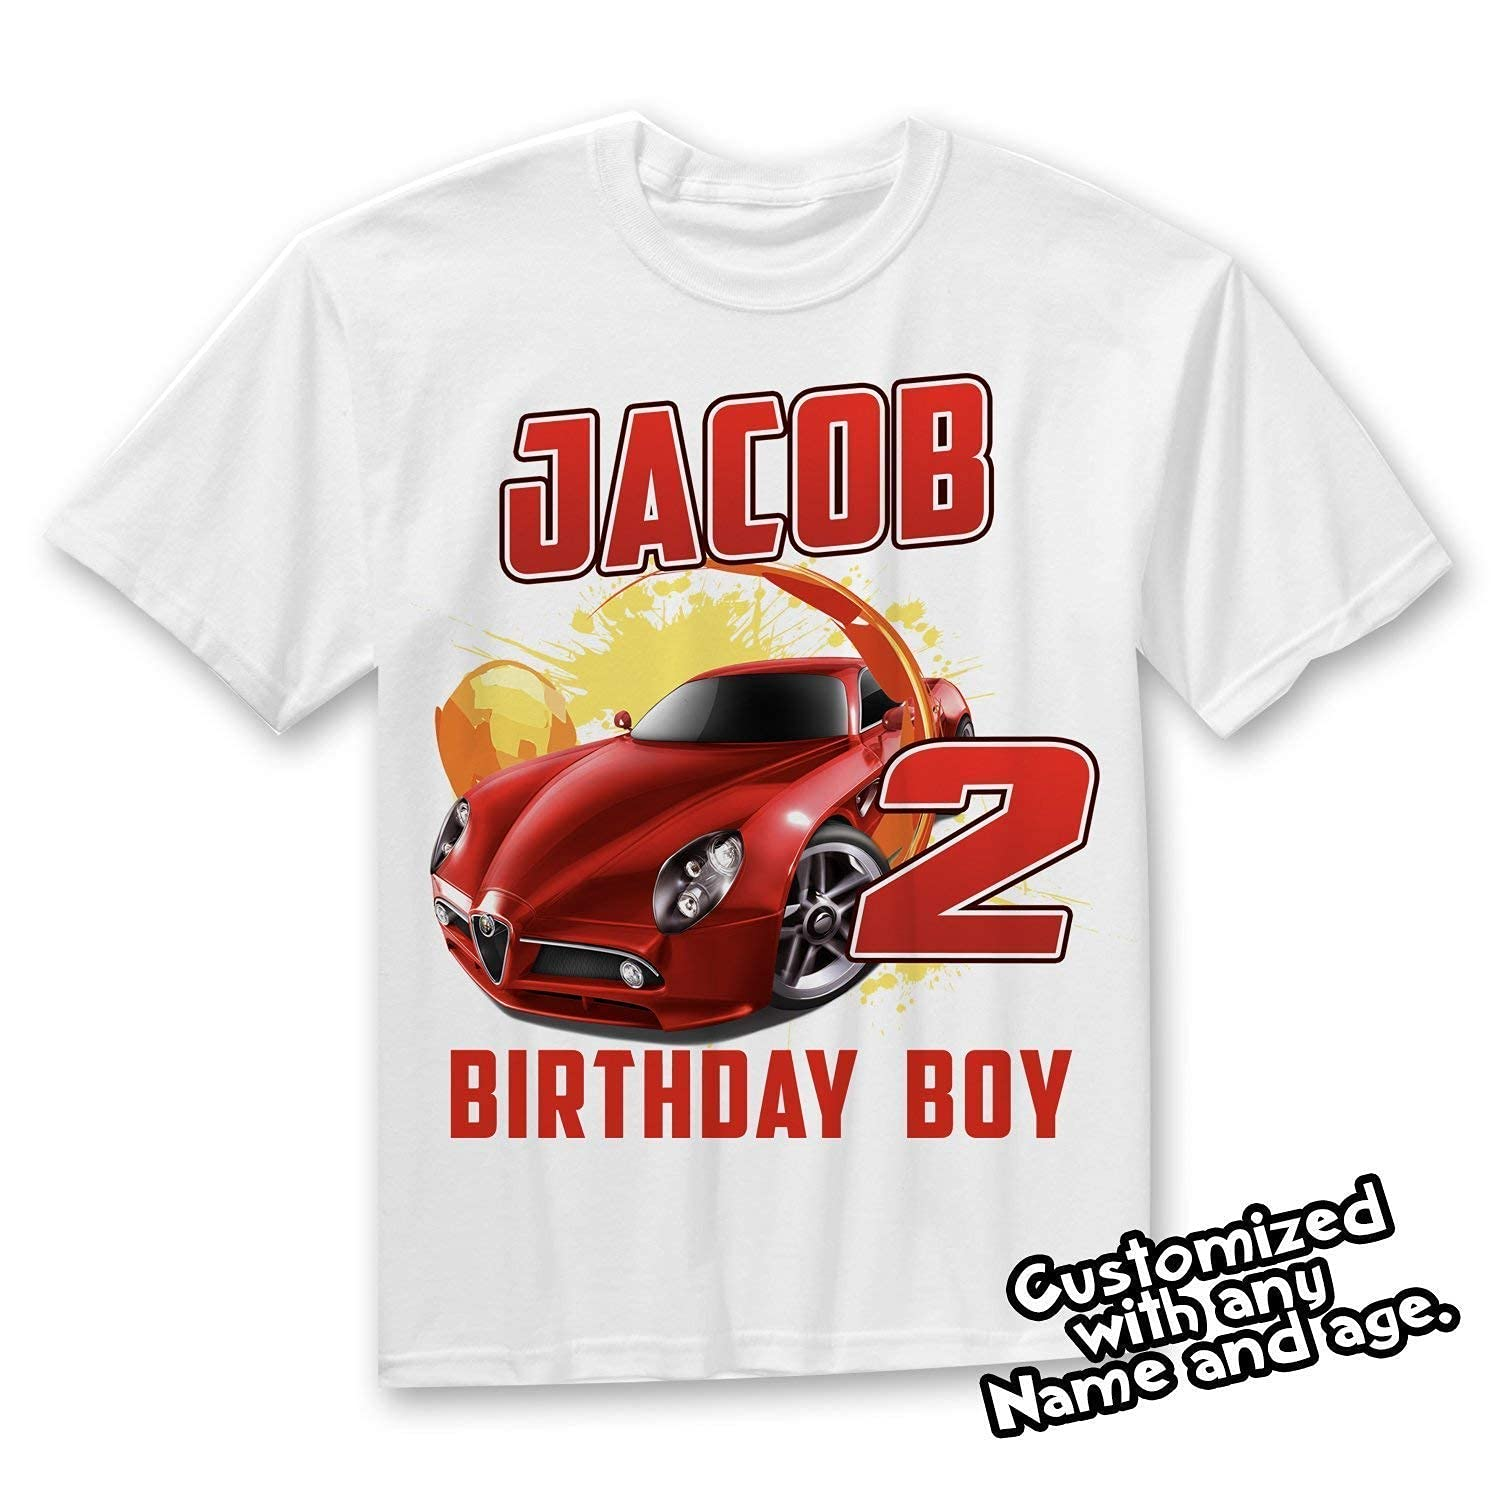 Boys Nascar Birthday Shirt Checkered Flag Race Car Birthday Race Track Personalized Shirt Kids Birthday Racing